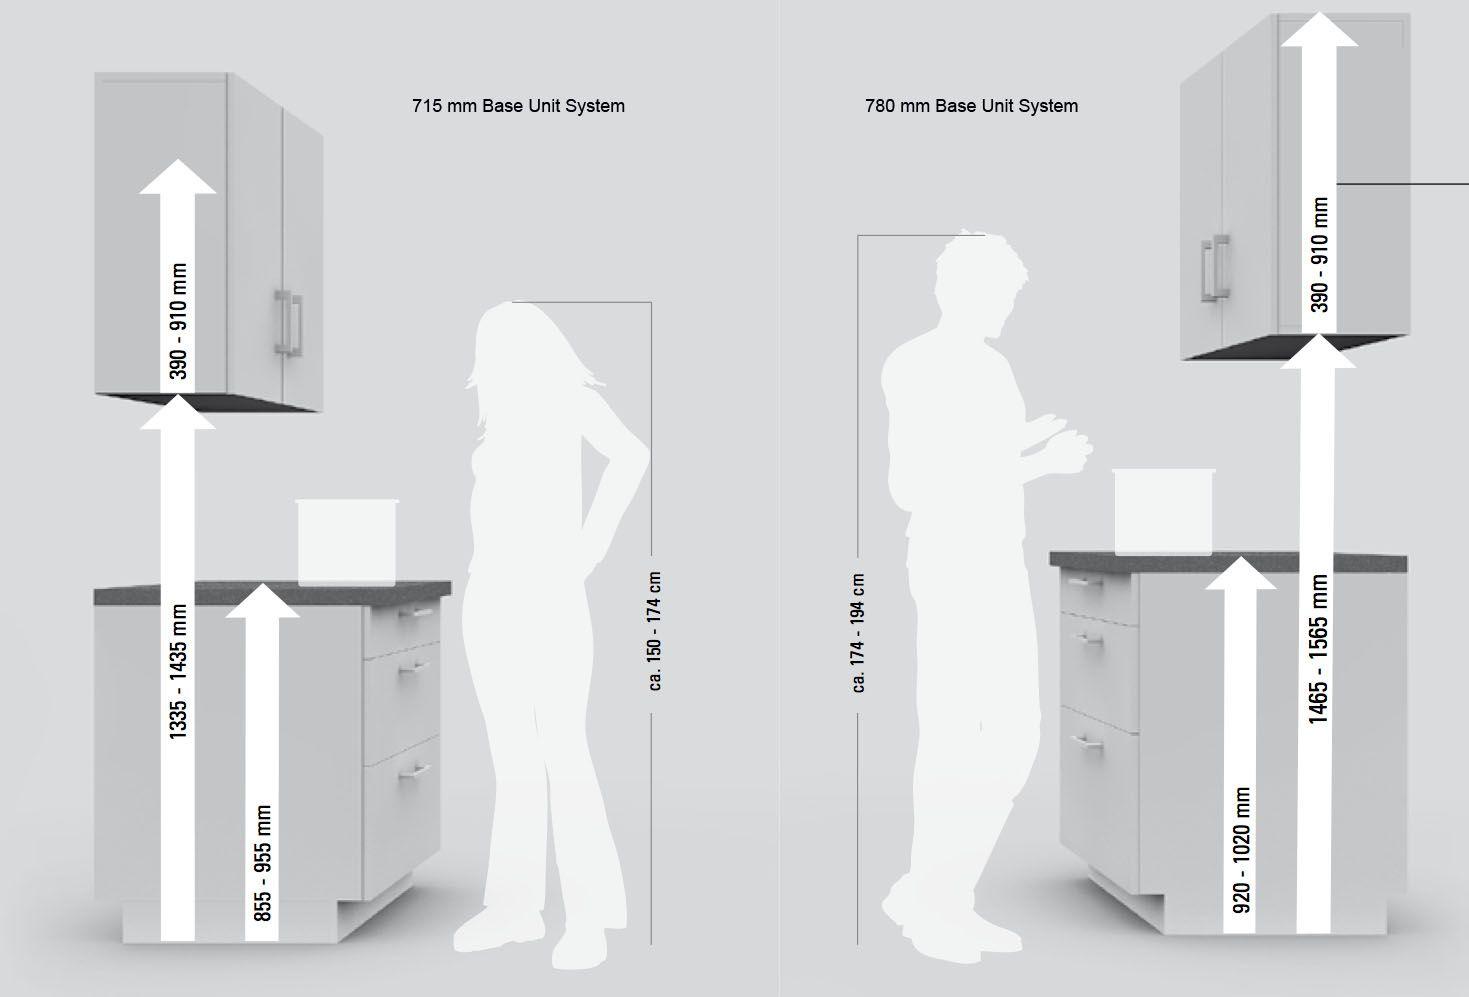 standard kitchen dimensions uk - Google Search | Kitchen ...